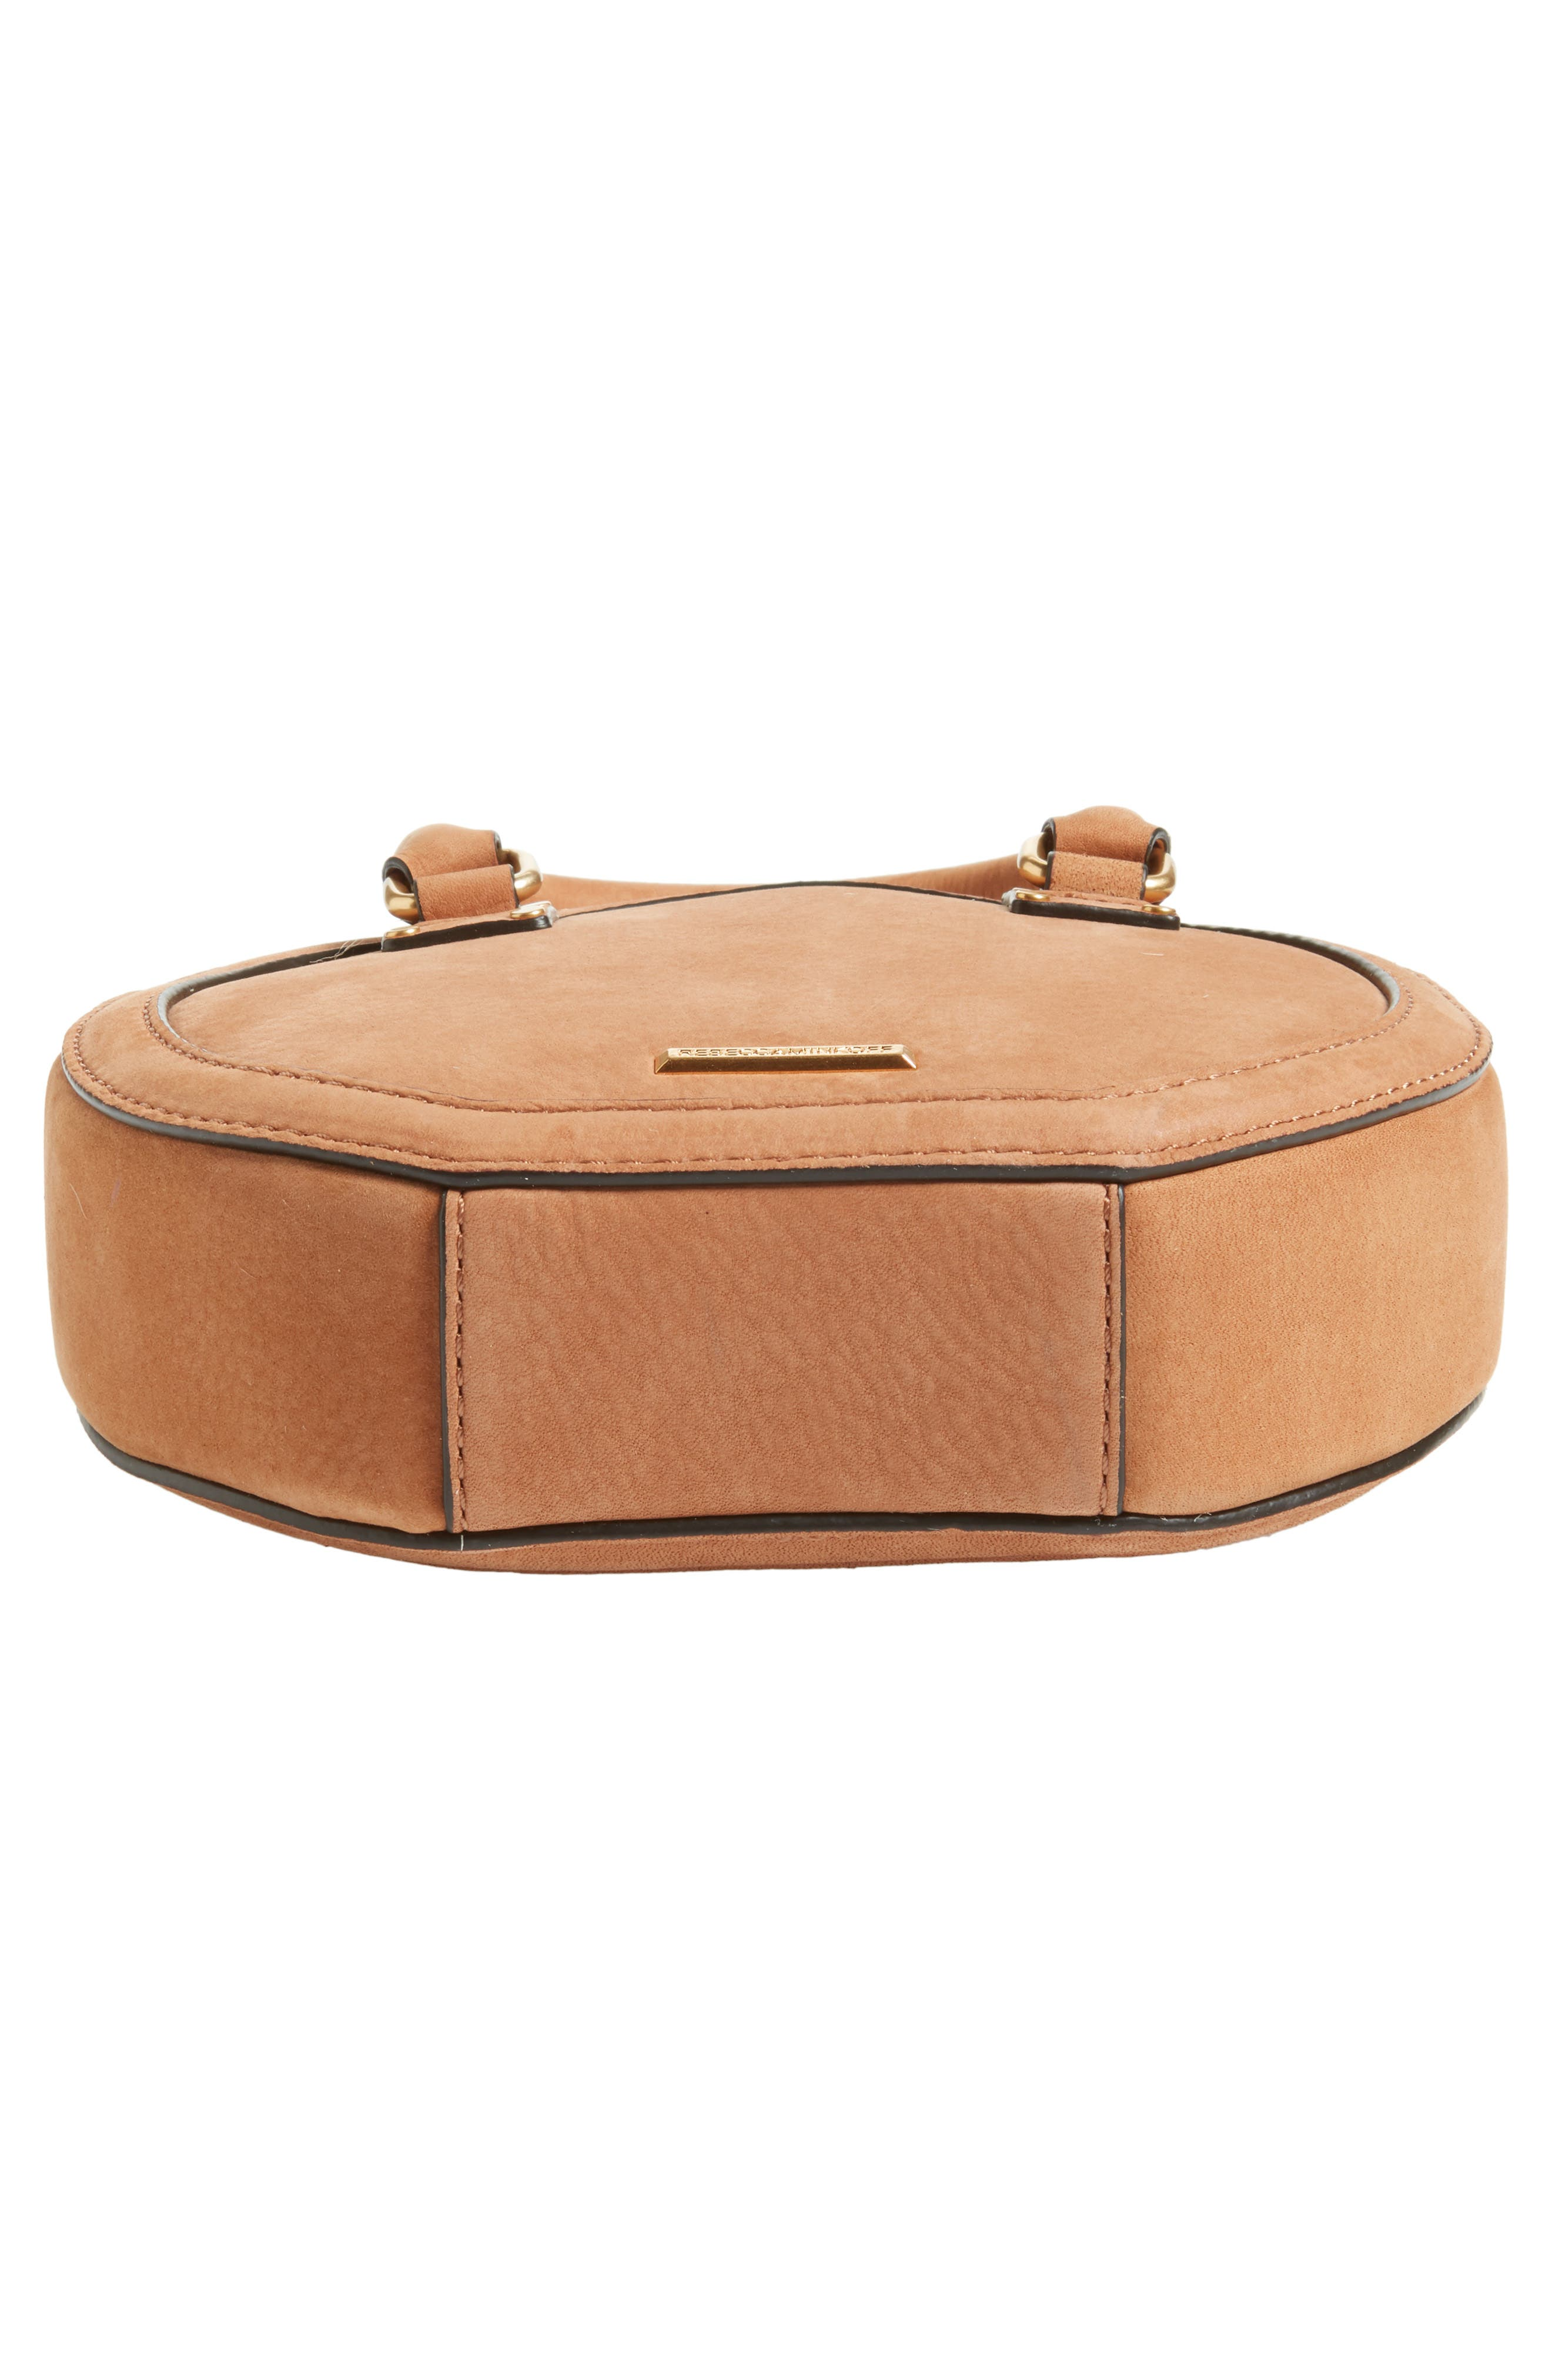 REBECCA MINKOFF, Bree Circle Crossbody Bag, Alternate thumbnail 6, color, 230